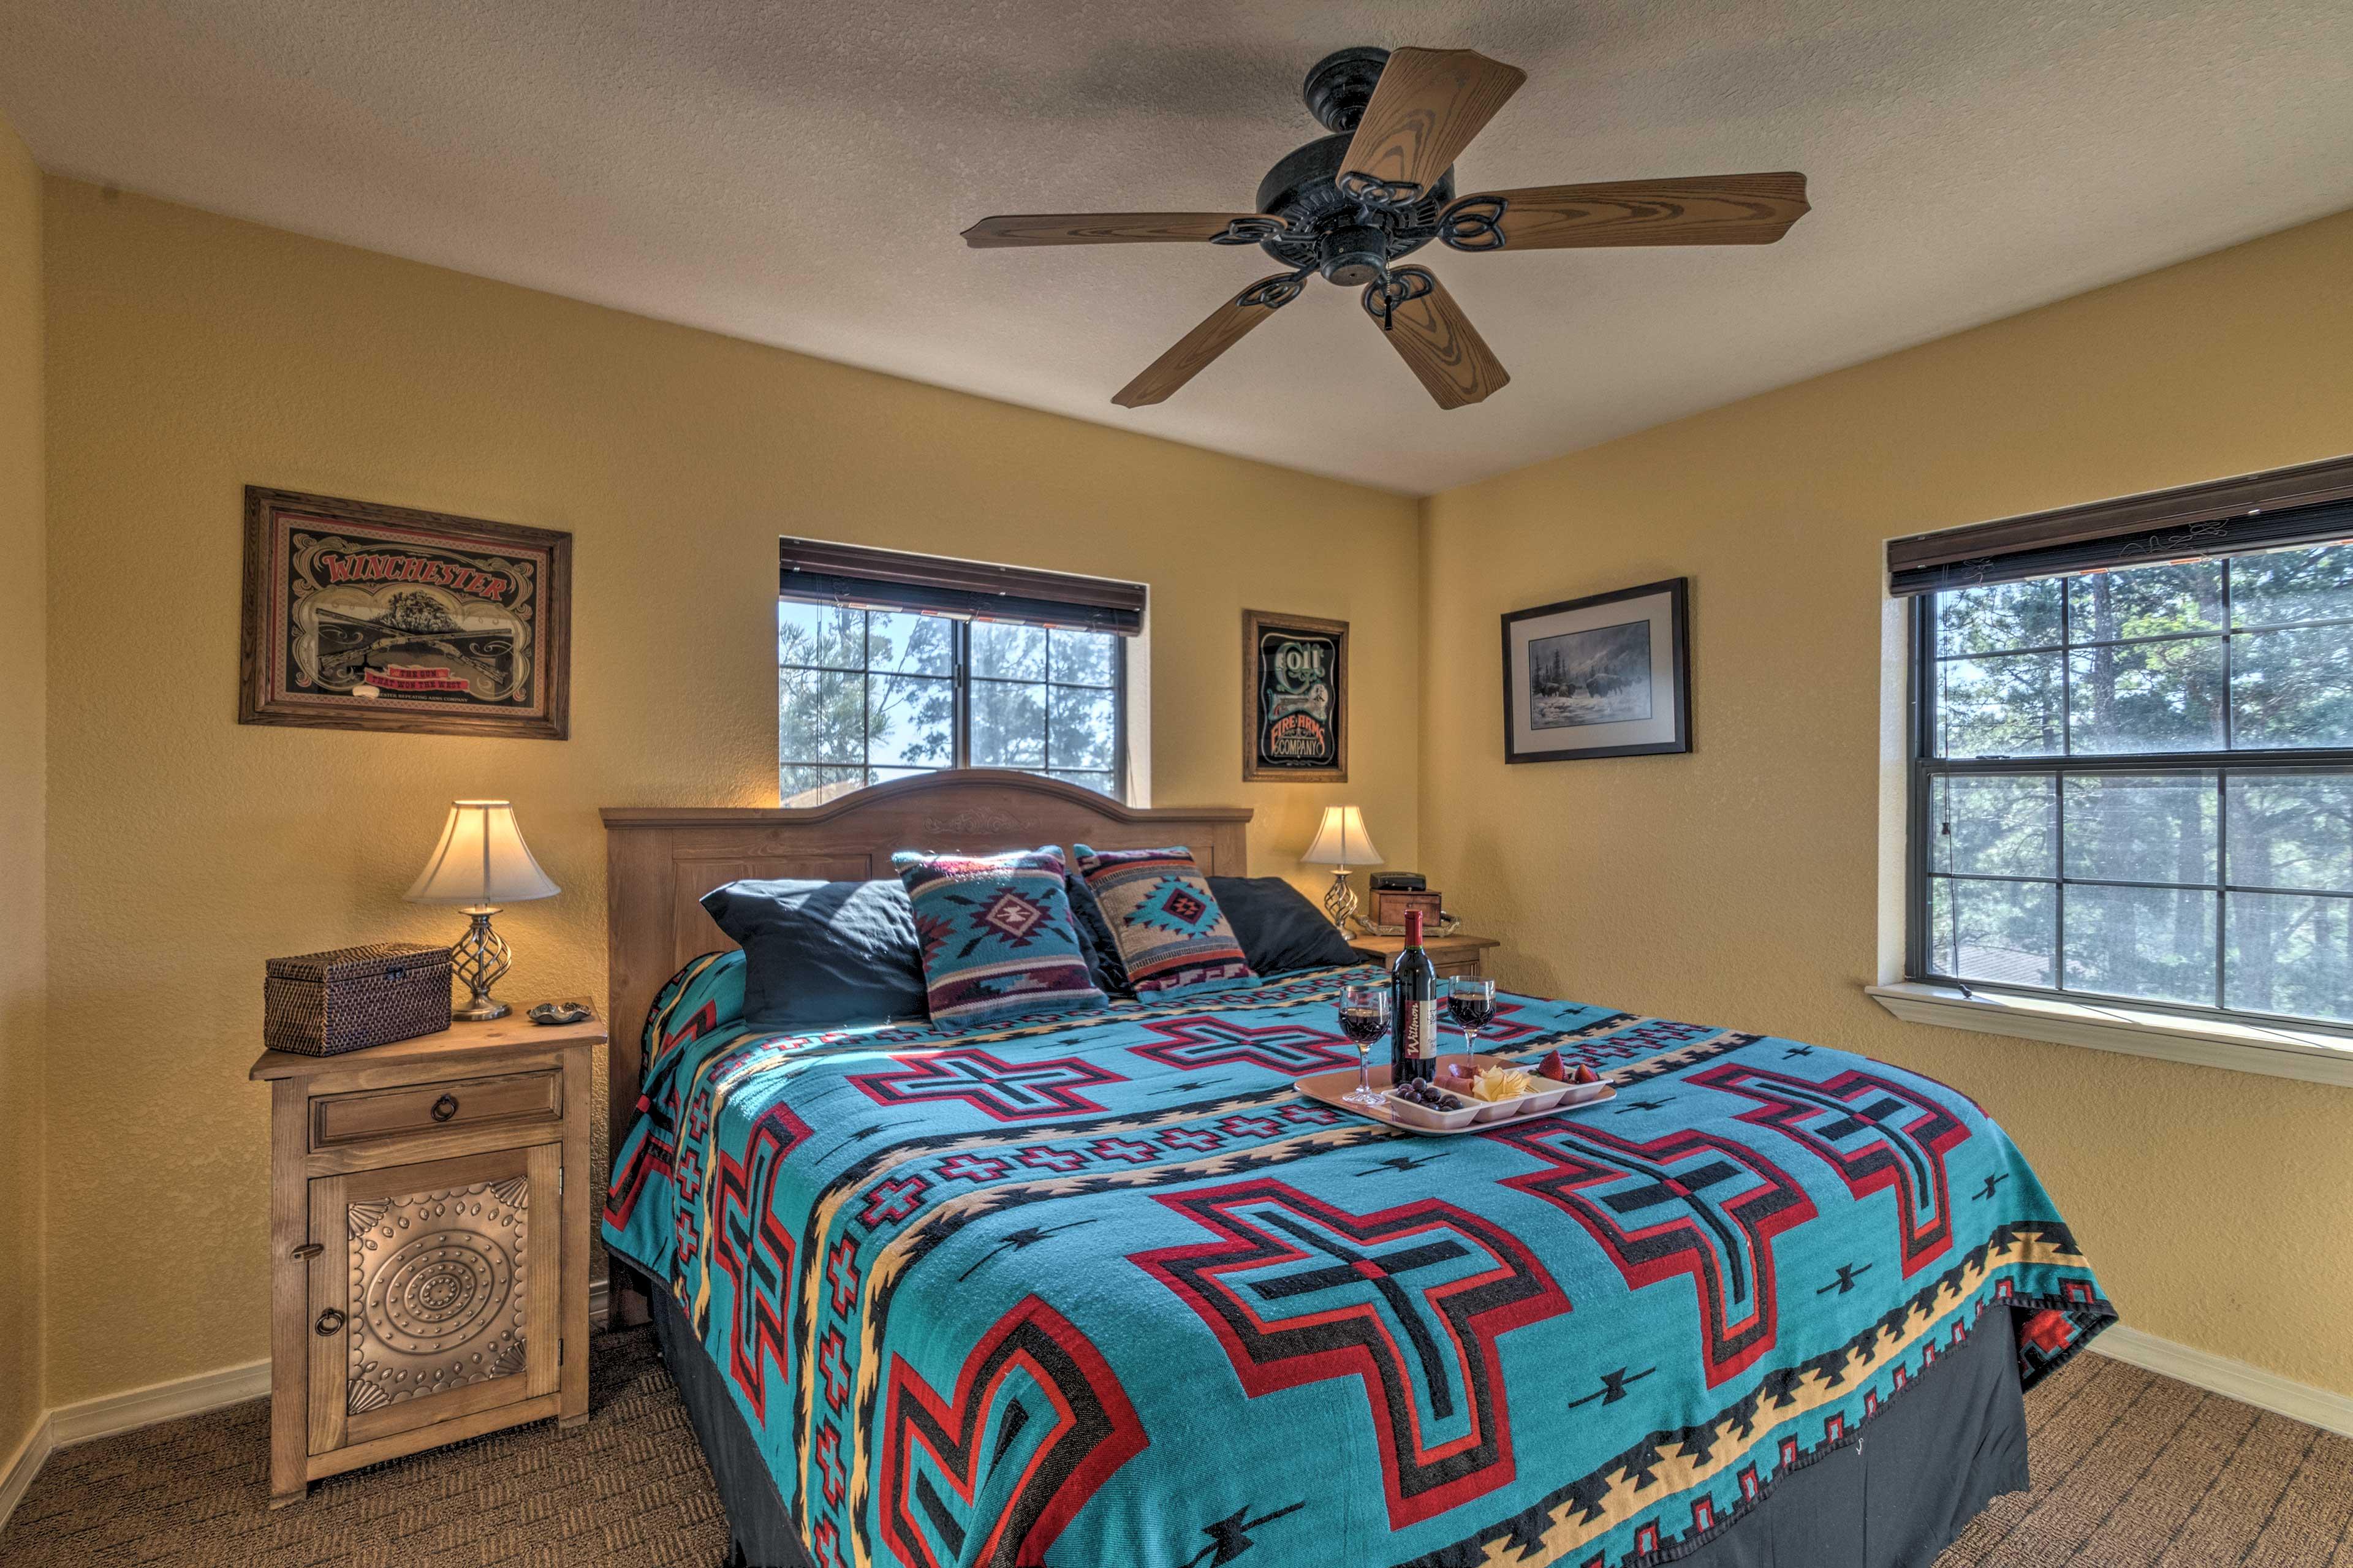 Nights of peaceful sleep await in bedroom 2.